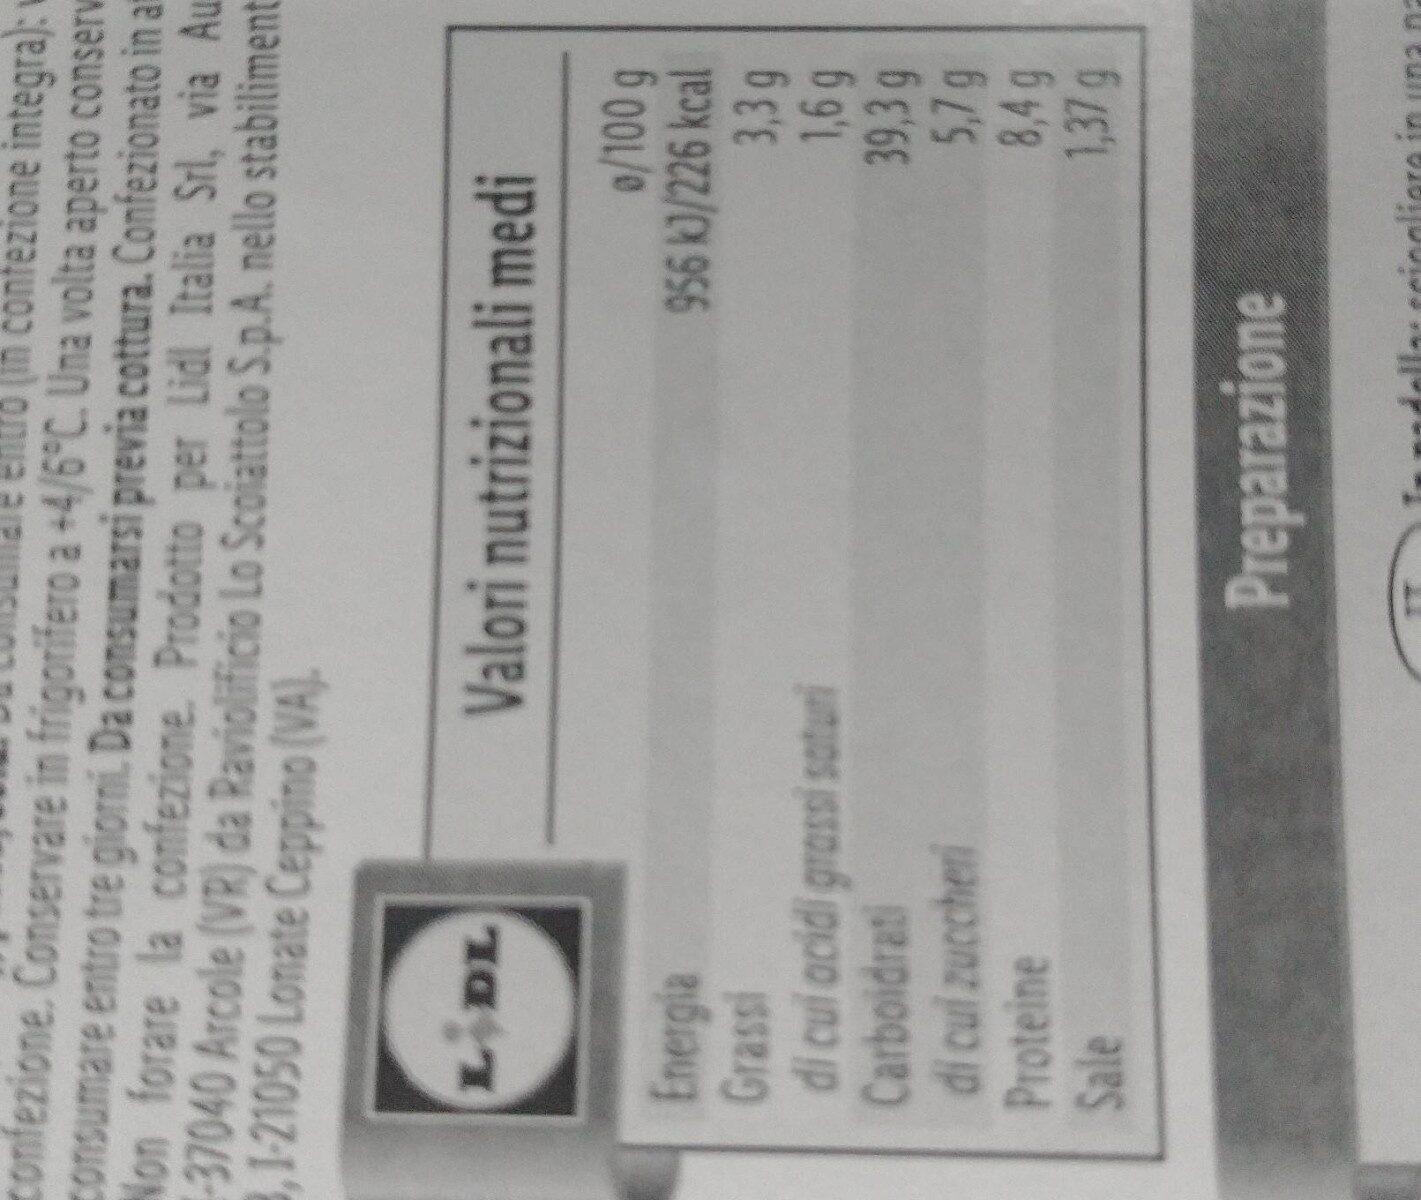 Pappardelle ripiene - Informations nutritionnelles - fr